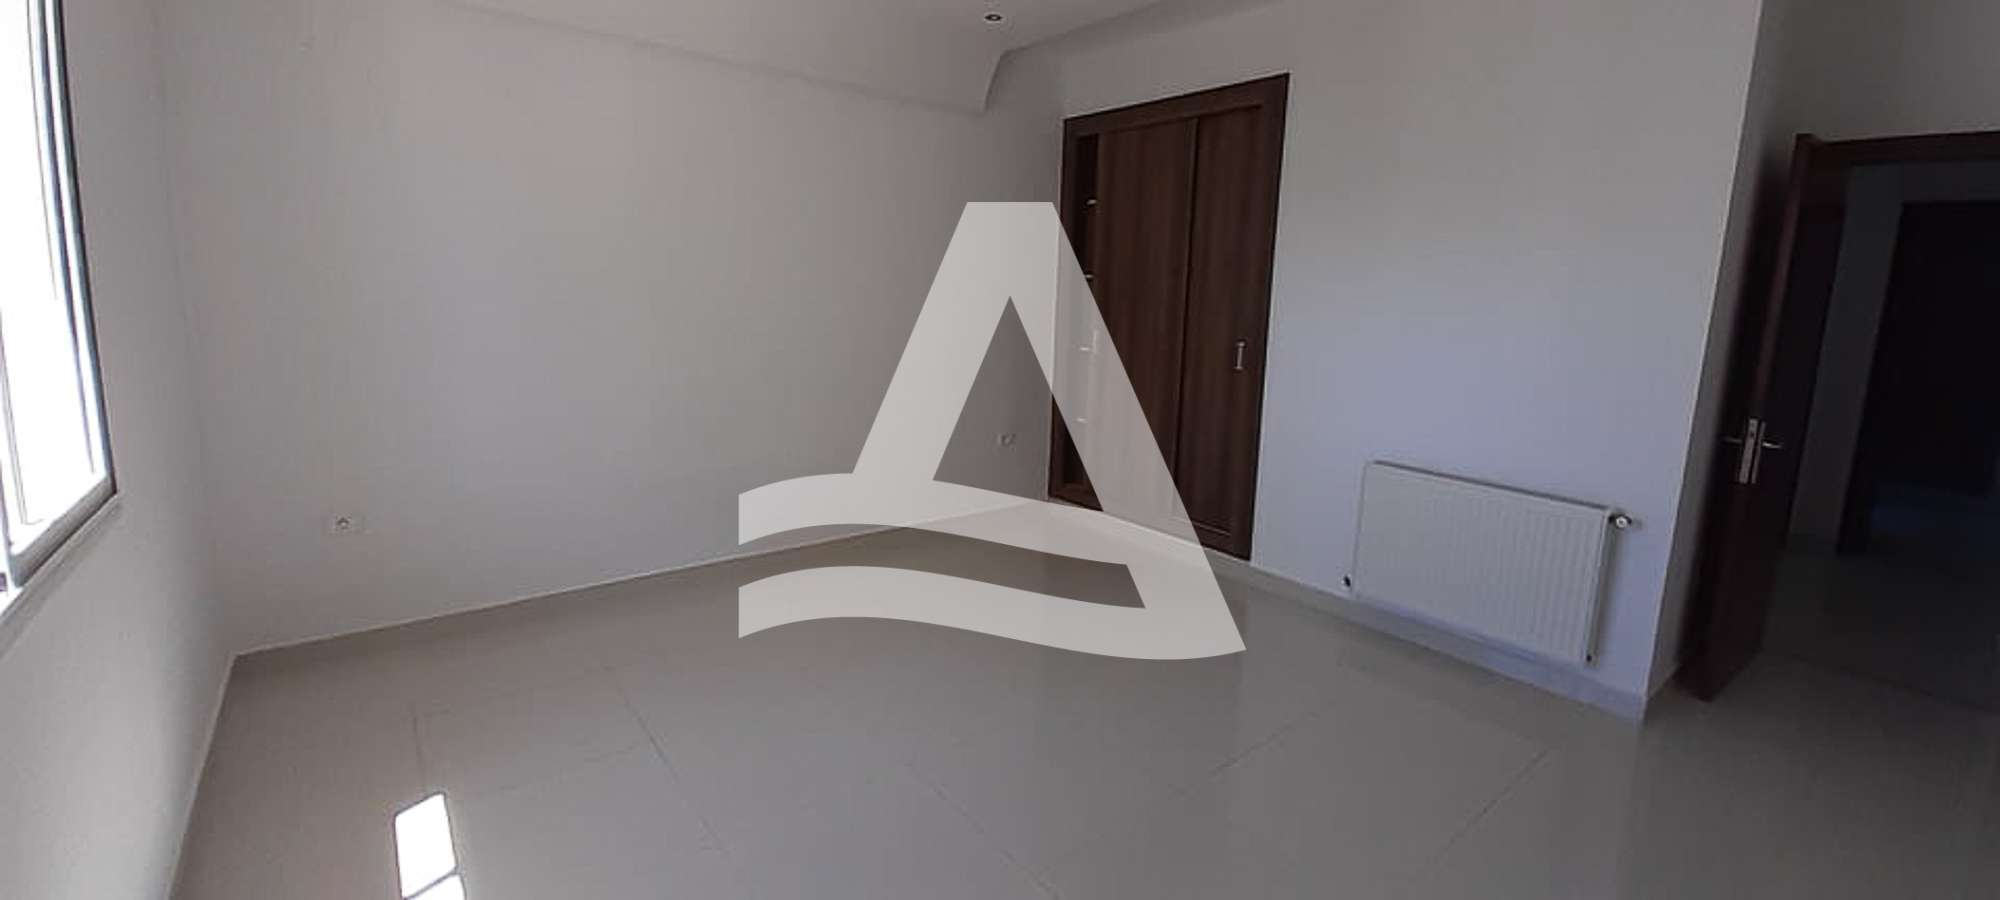 httpss3.amazonaws.comlogimoawshttpss3_amazonaws_comlogimoaws_Arcane_immobilière_la_Marsa-_location_-_vente_la_marsa__-6-2